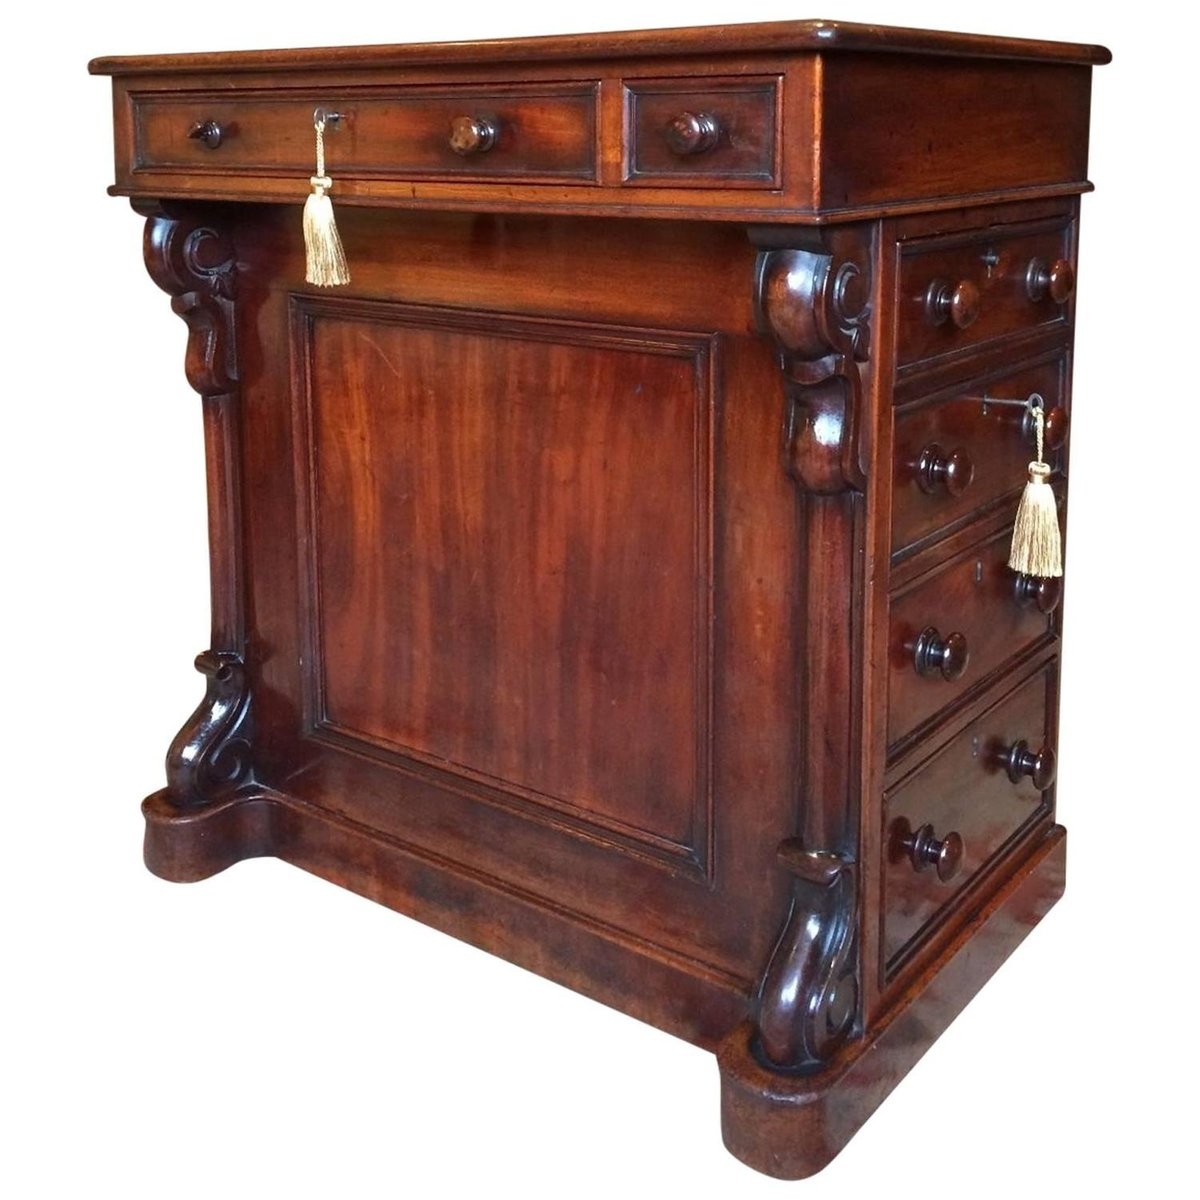 Antique Victorian Mahogany Davenport Desk, 1850s - Antique Victorian Mahogany Davenport Desk, 1850s For Sale At Pamono